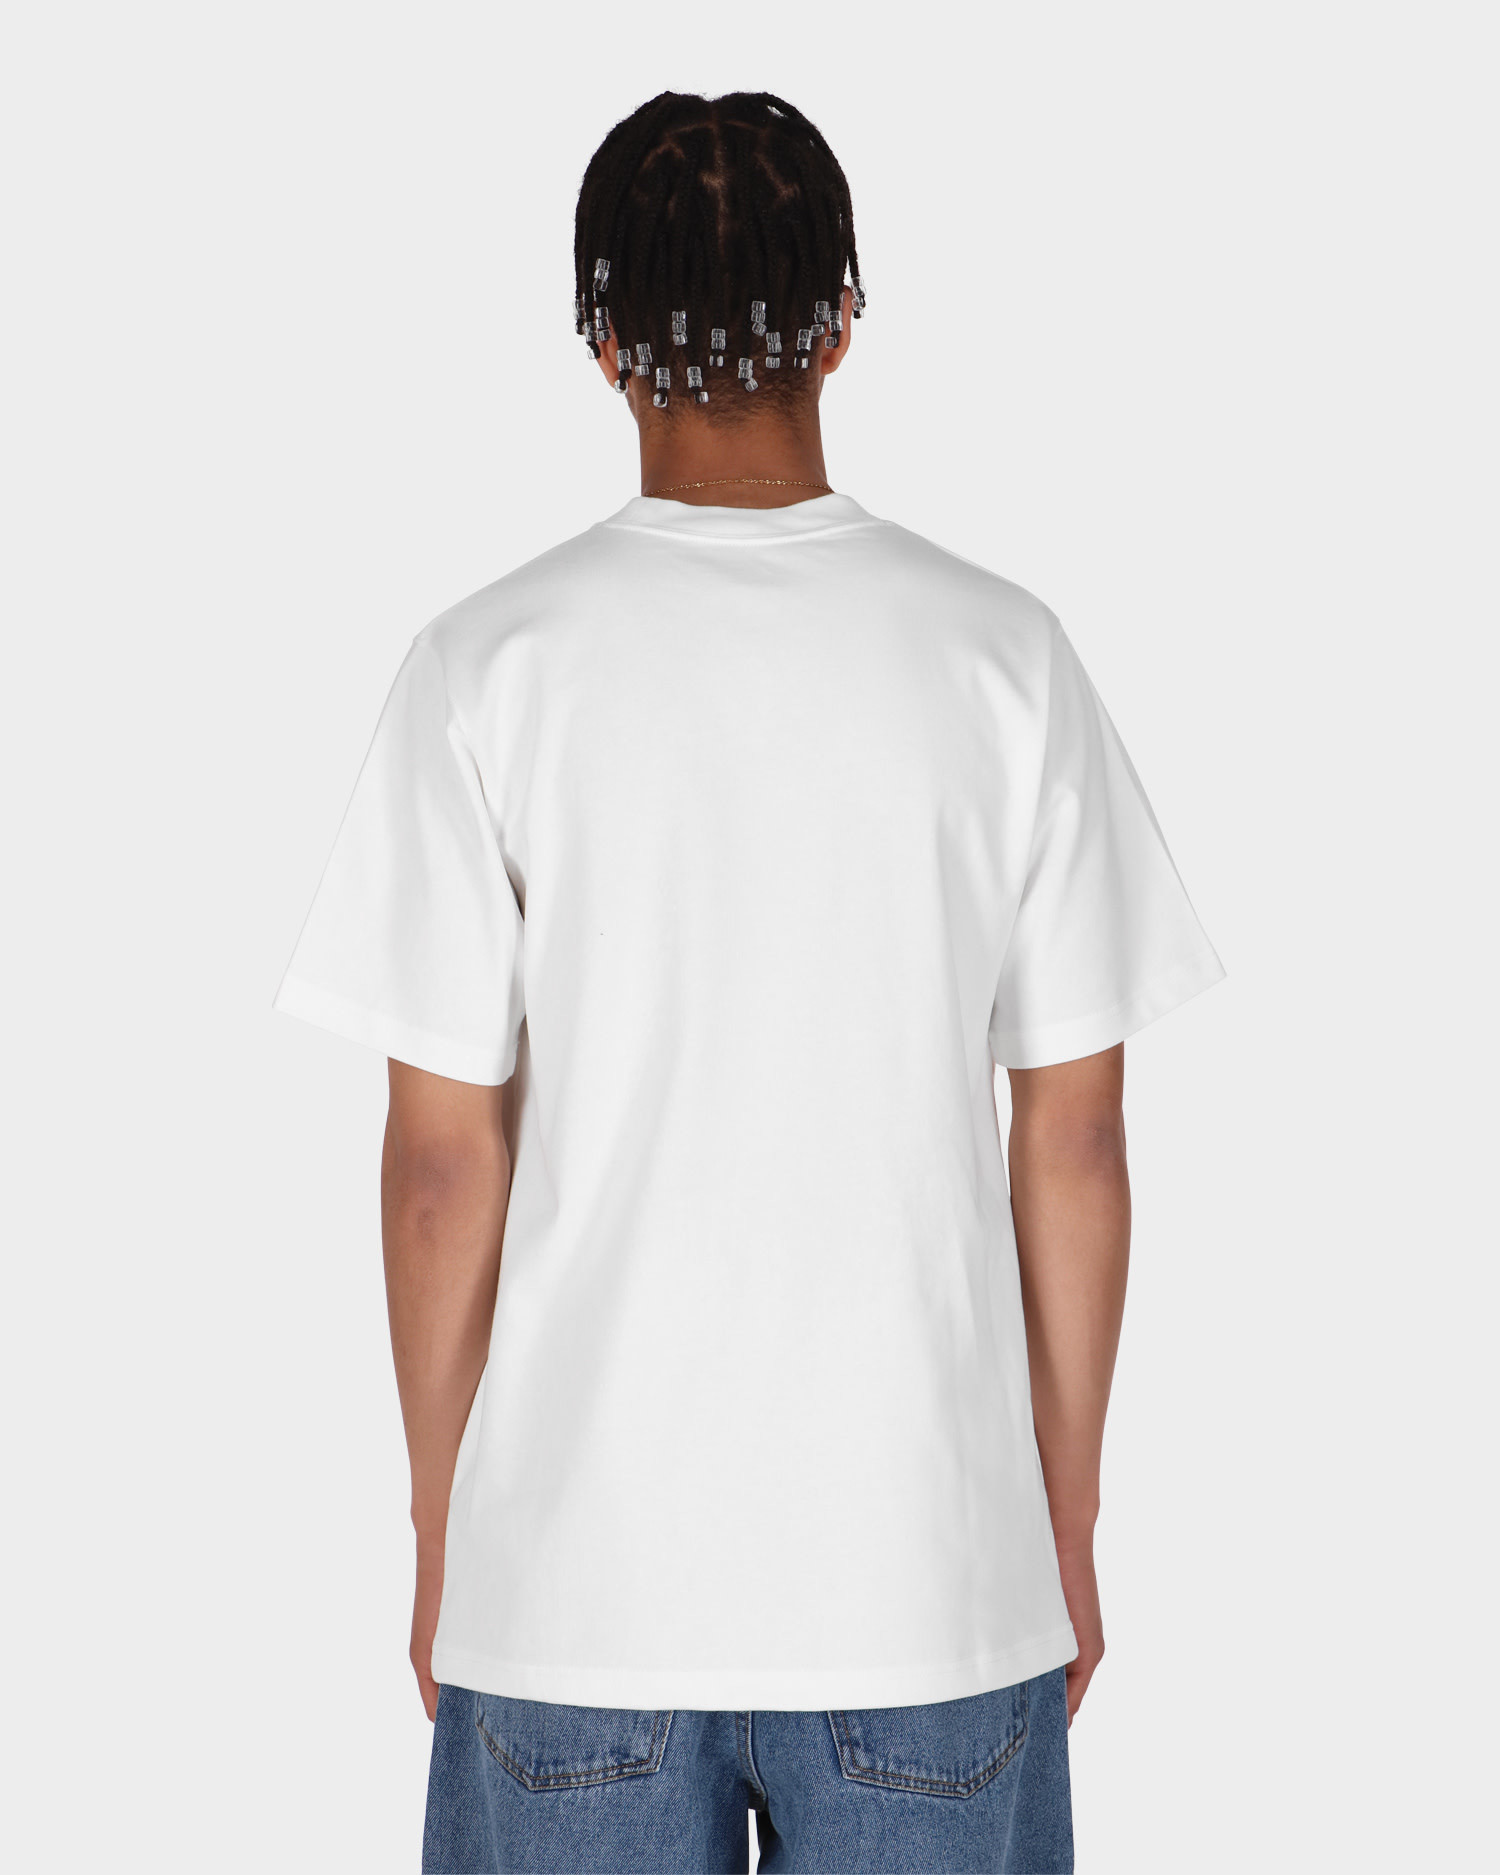 Nike SB x Killing Floor T-Shirt White